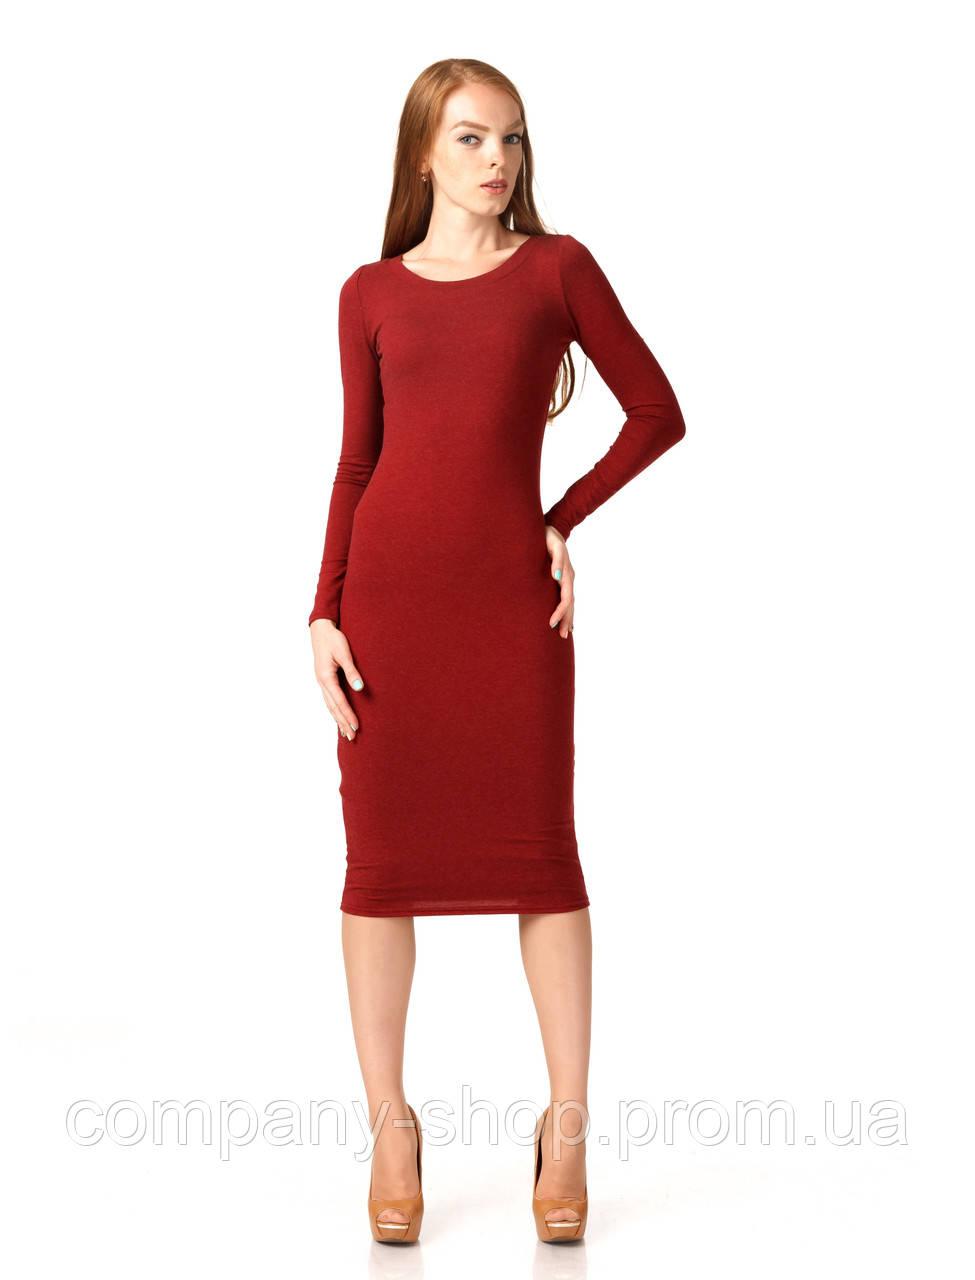 Женское платье футляр оптом. Модель П092_бордо поливискон.